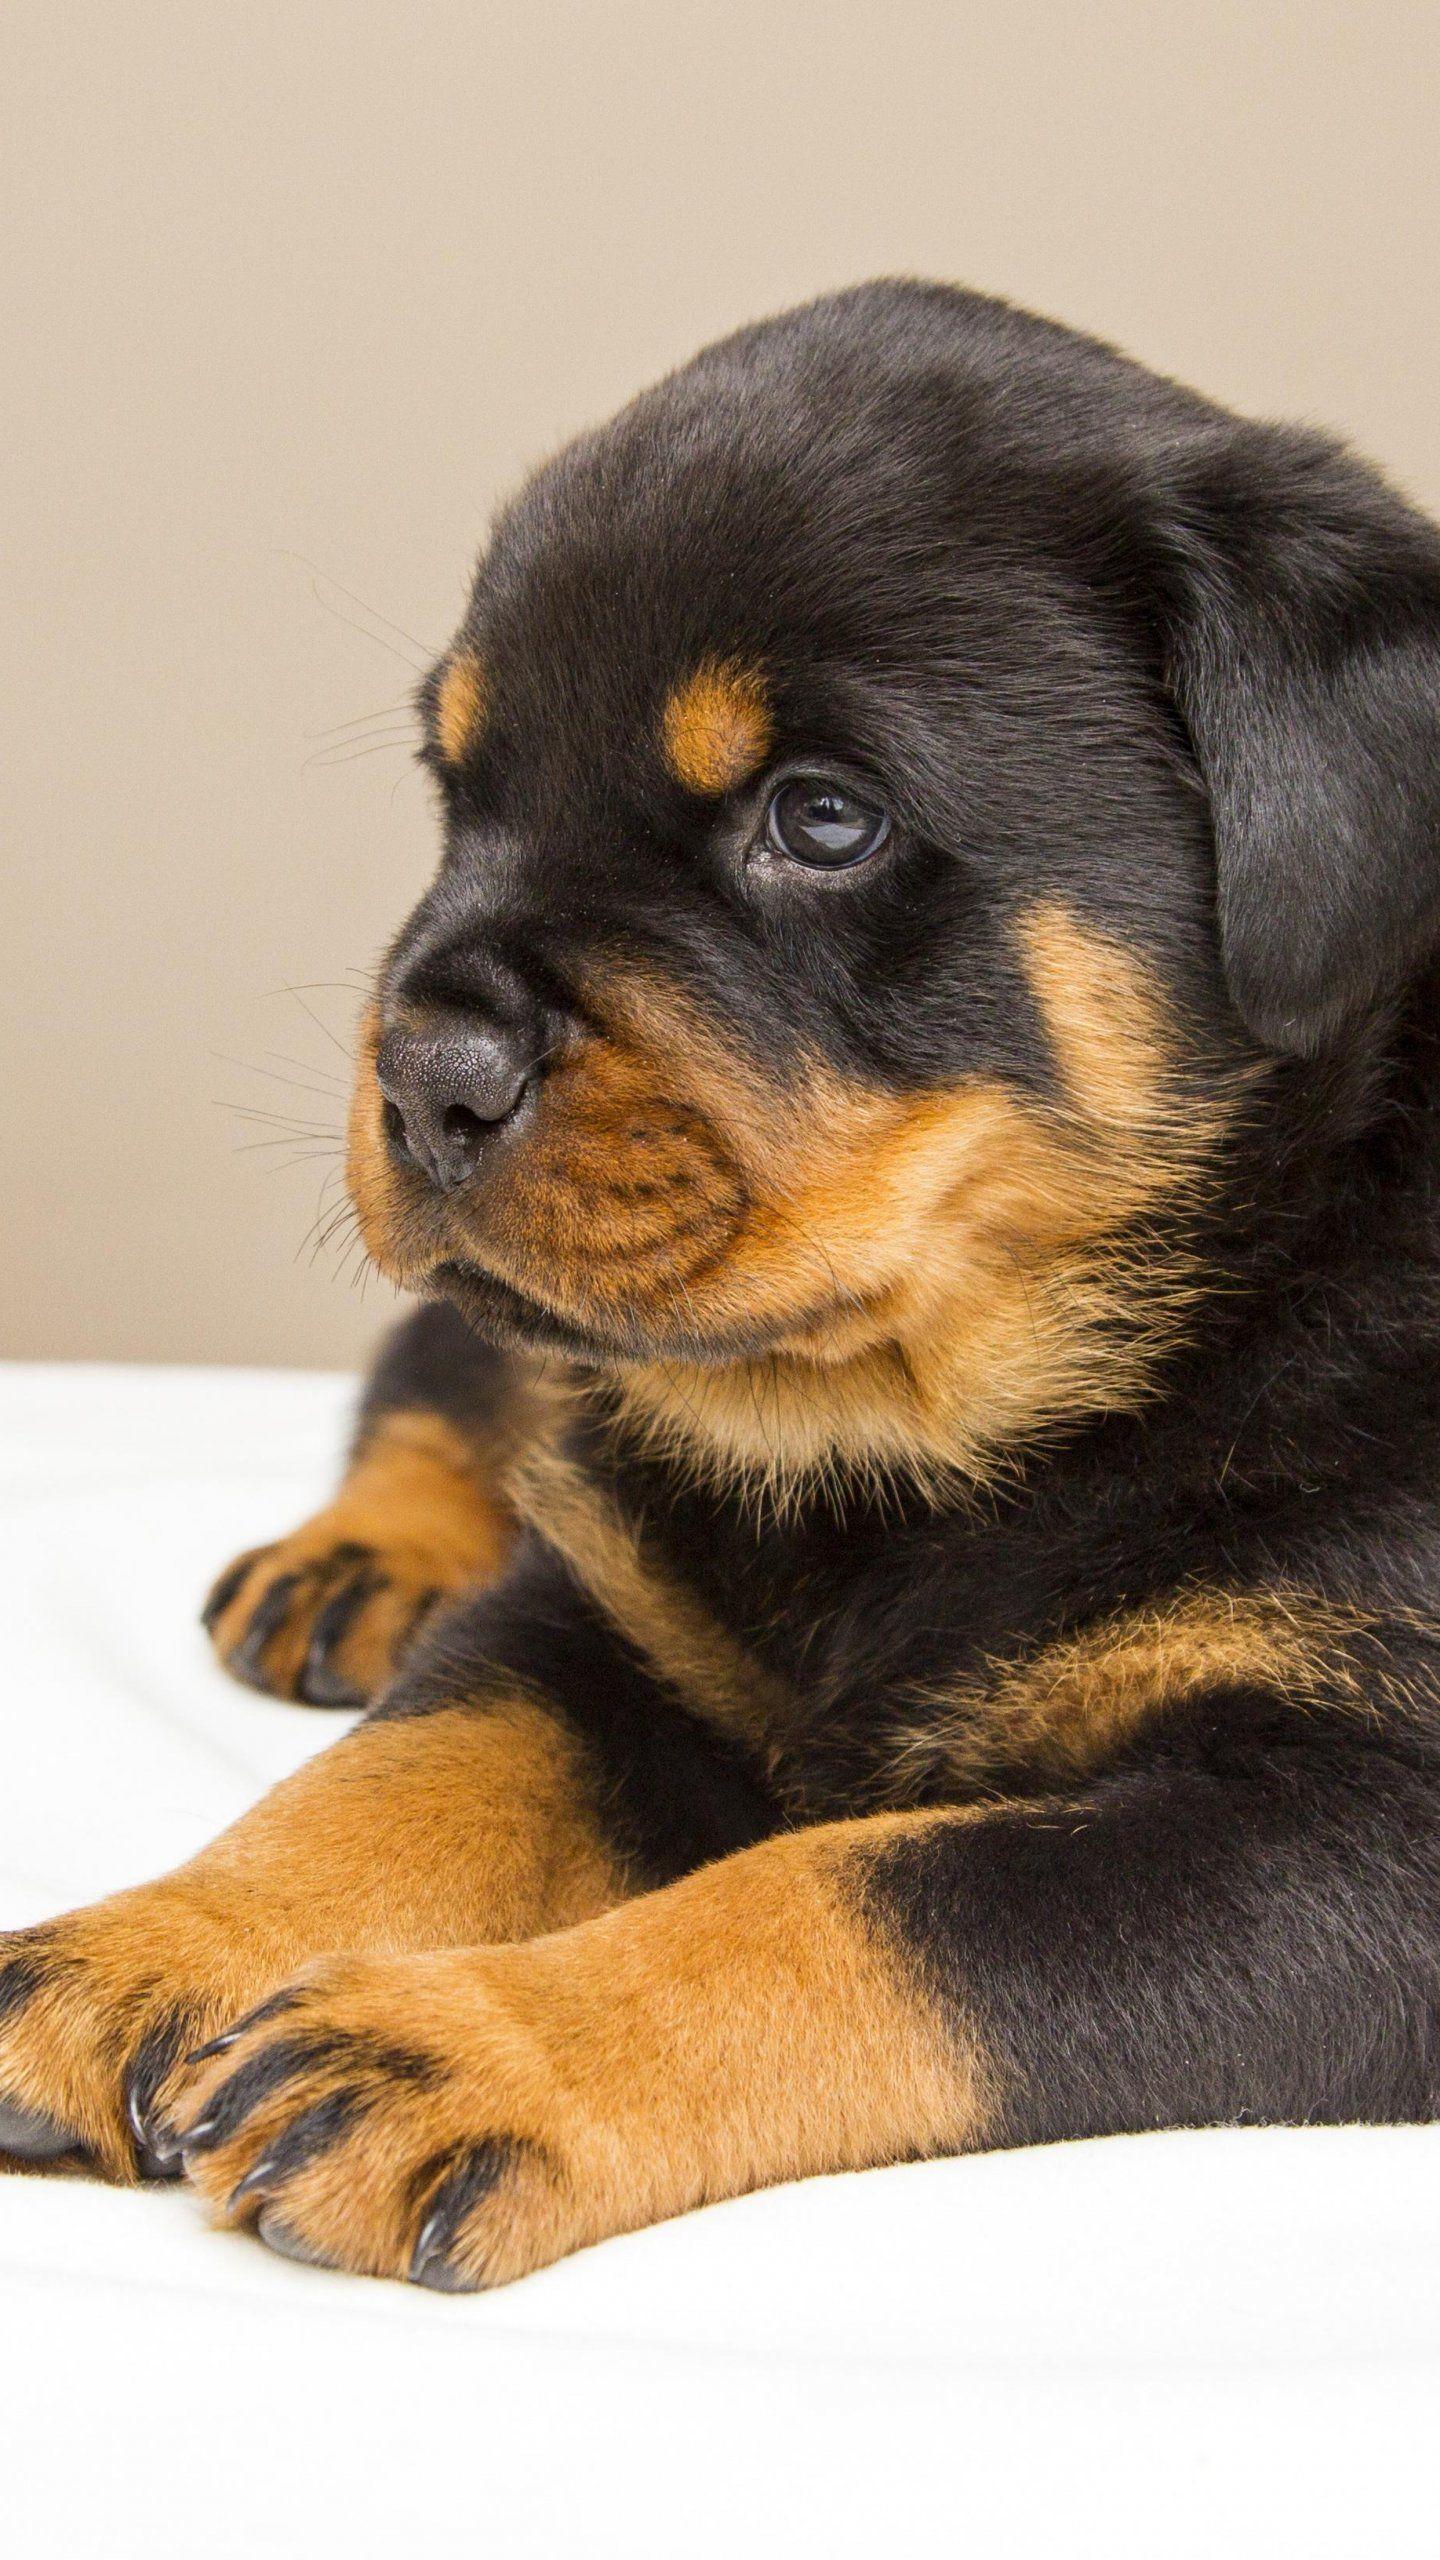 Rottweiler Puppy Wallpaper Iphone Android Desktop Backgrounds Rottweiler Puppies Puppies Dog Training